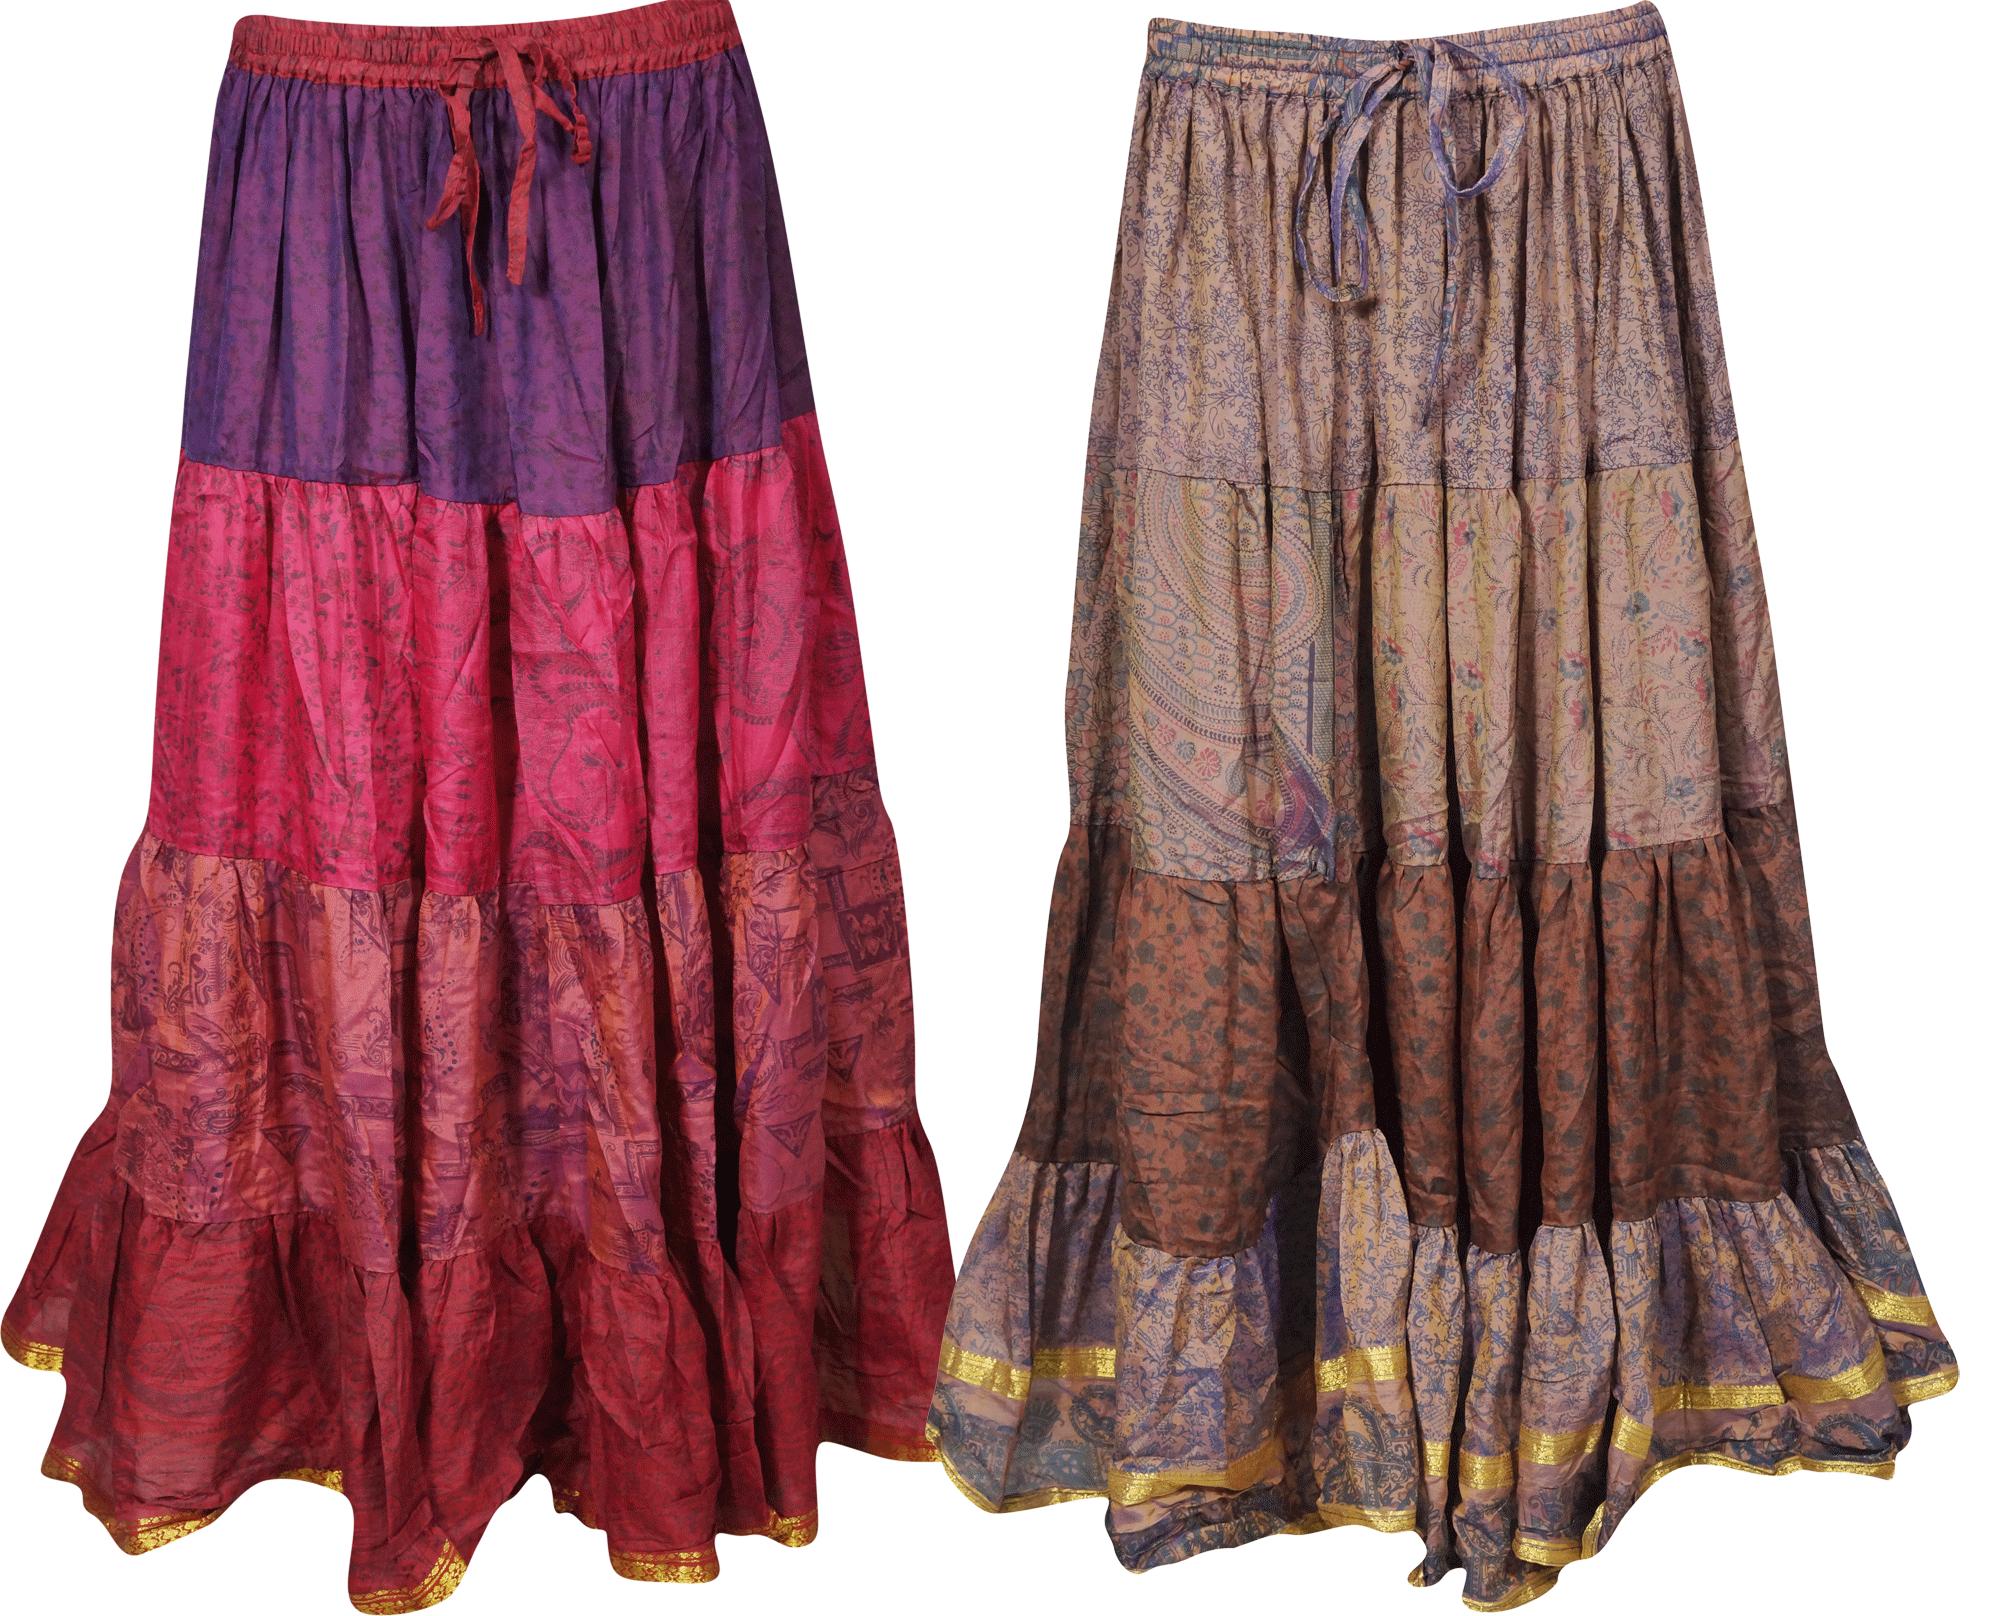 Mogul Interior - Mogul Lot Of 2 Pcs Womens Gypsy Skirts Vintage Silk